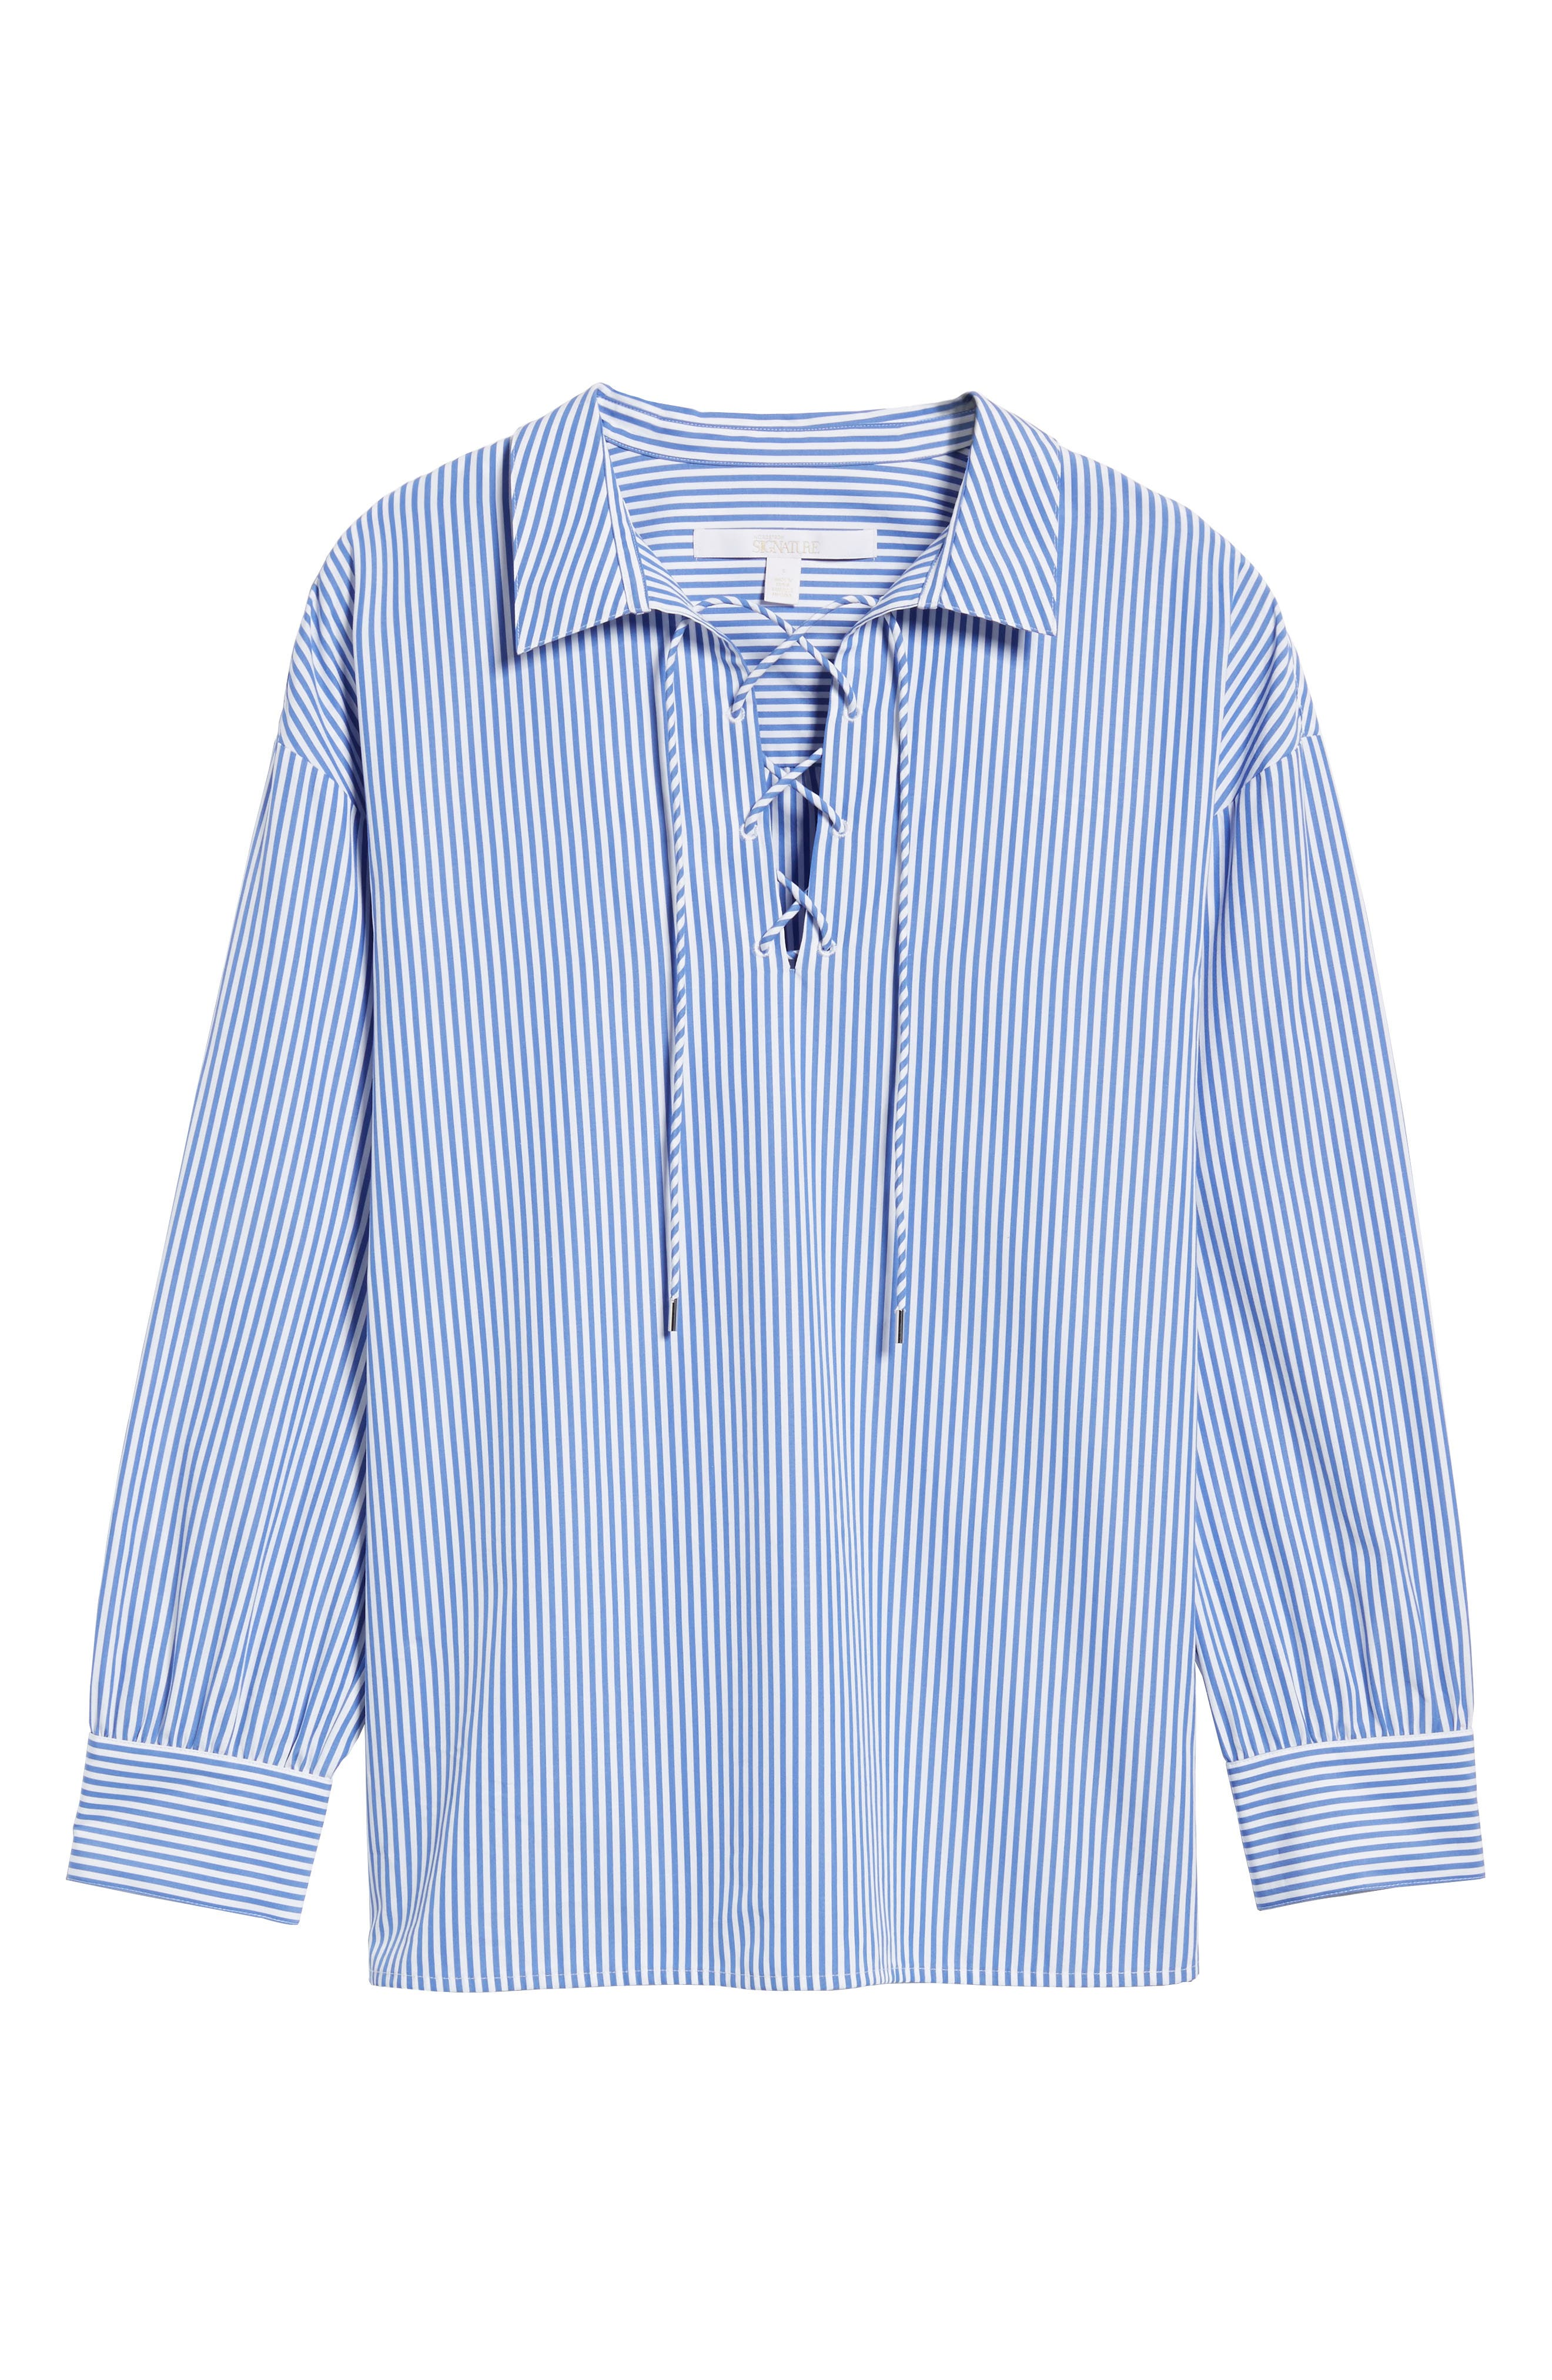 Lace-Up Stripe Shirt,                             Alternate thumbnail 6, color,                             420